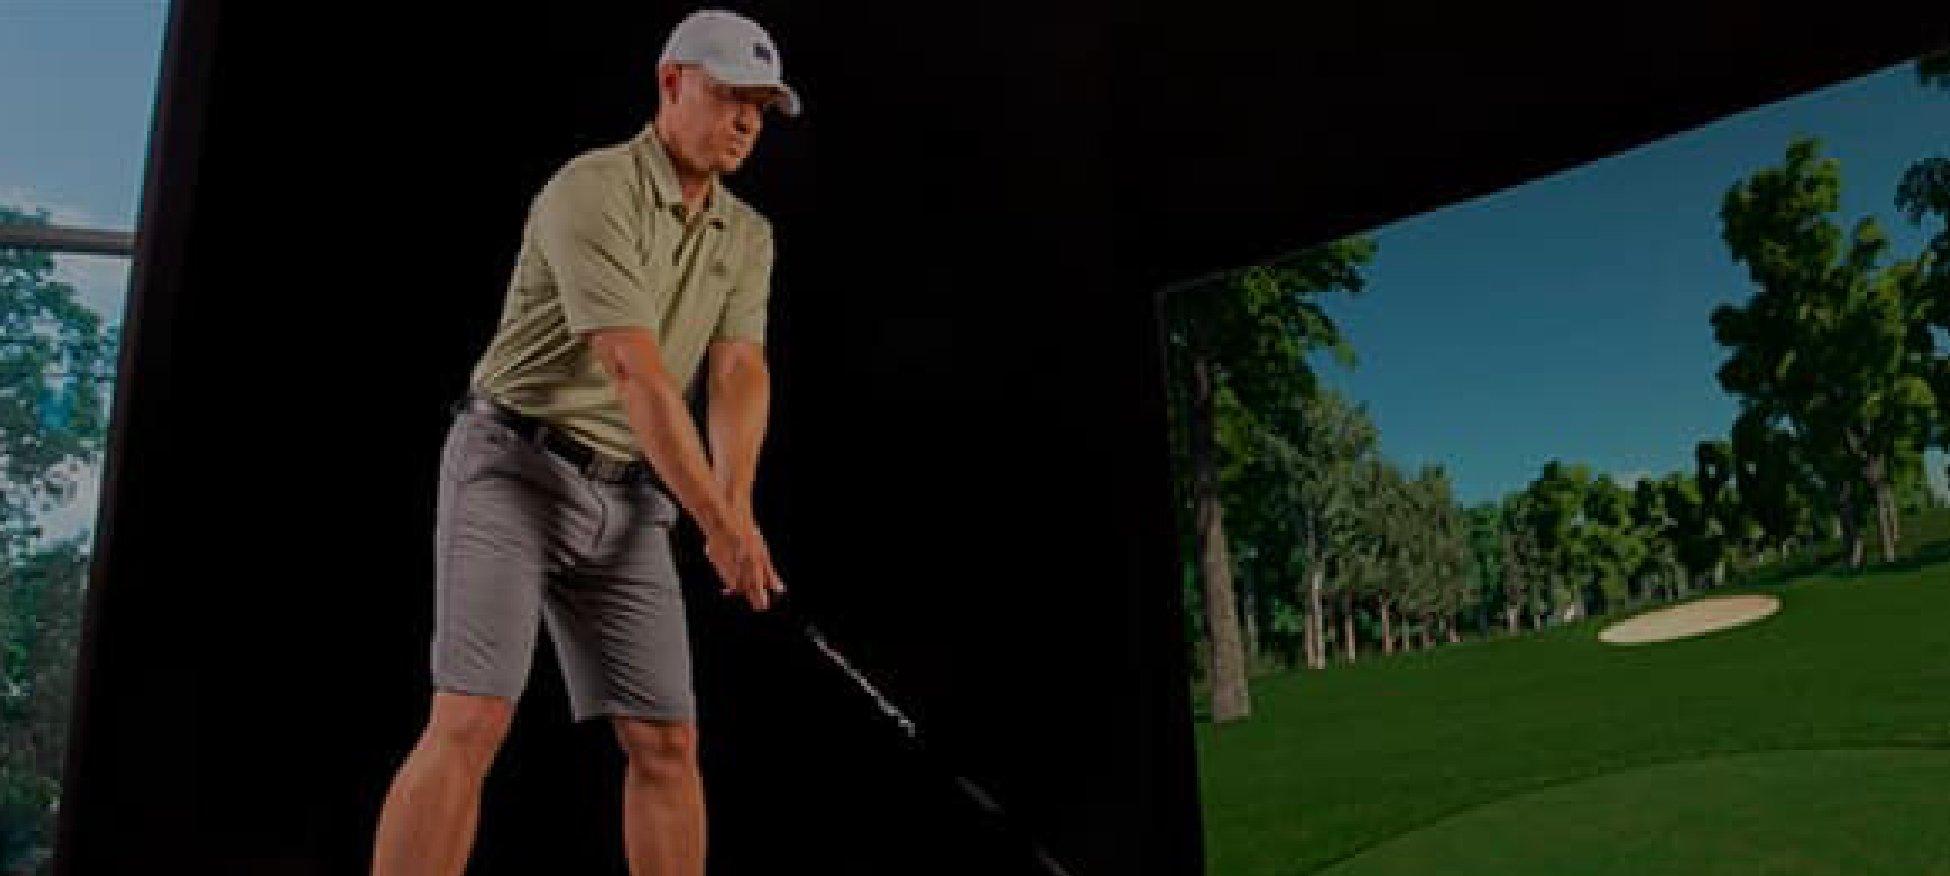 golf-simulators__golf-enclosures-and-impact-screens